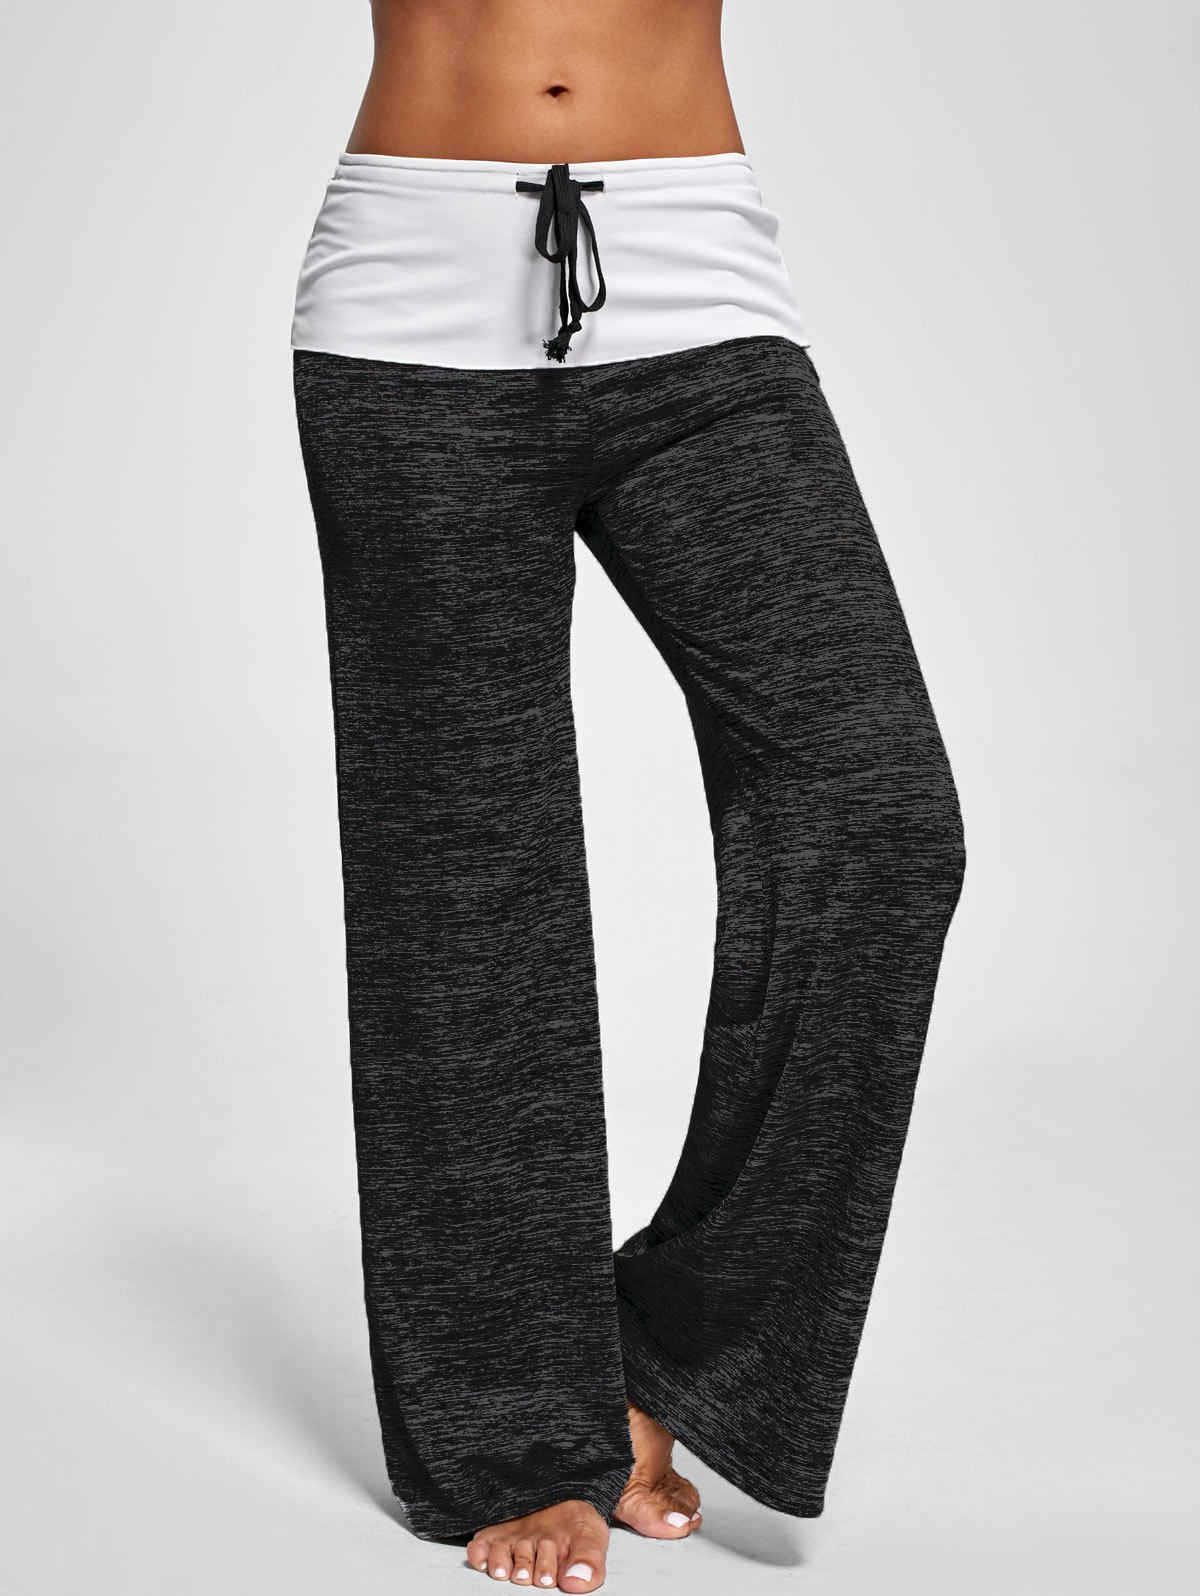 wide     leg     pants   2018 autumn women fashion sexy sports fashion clothing sexy   pant   plus size women sweatpants boho punk